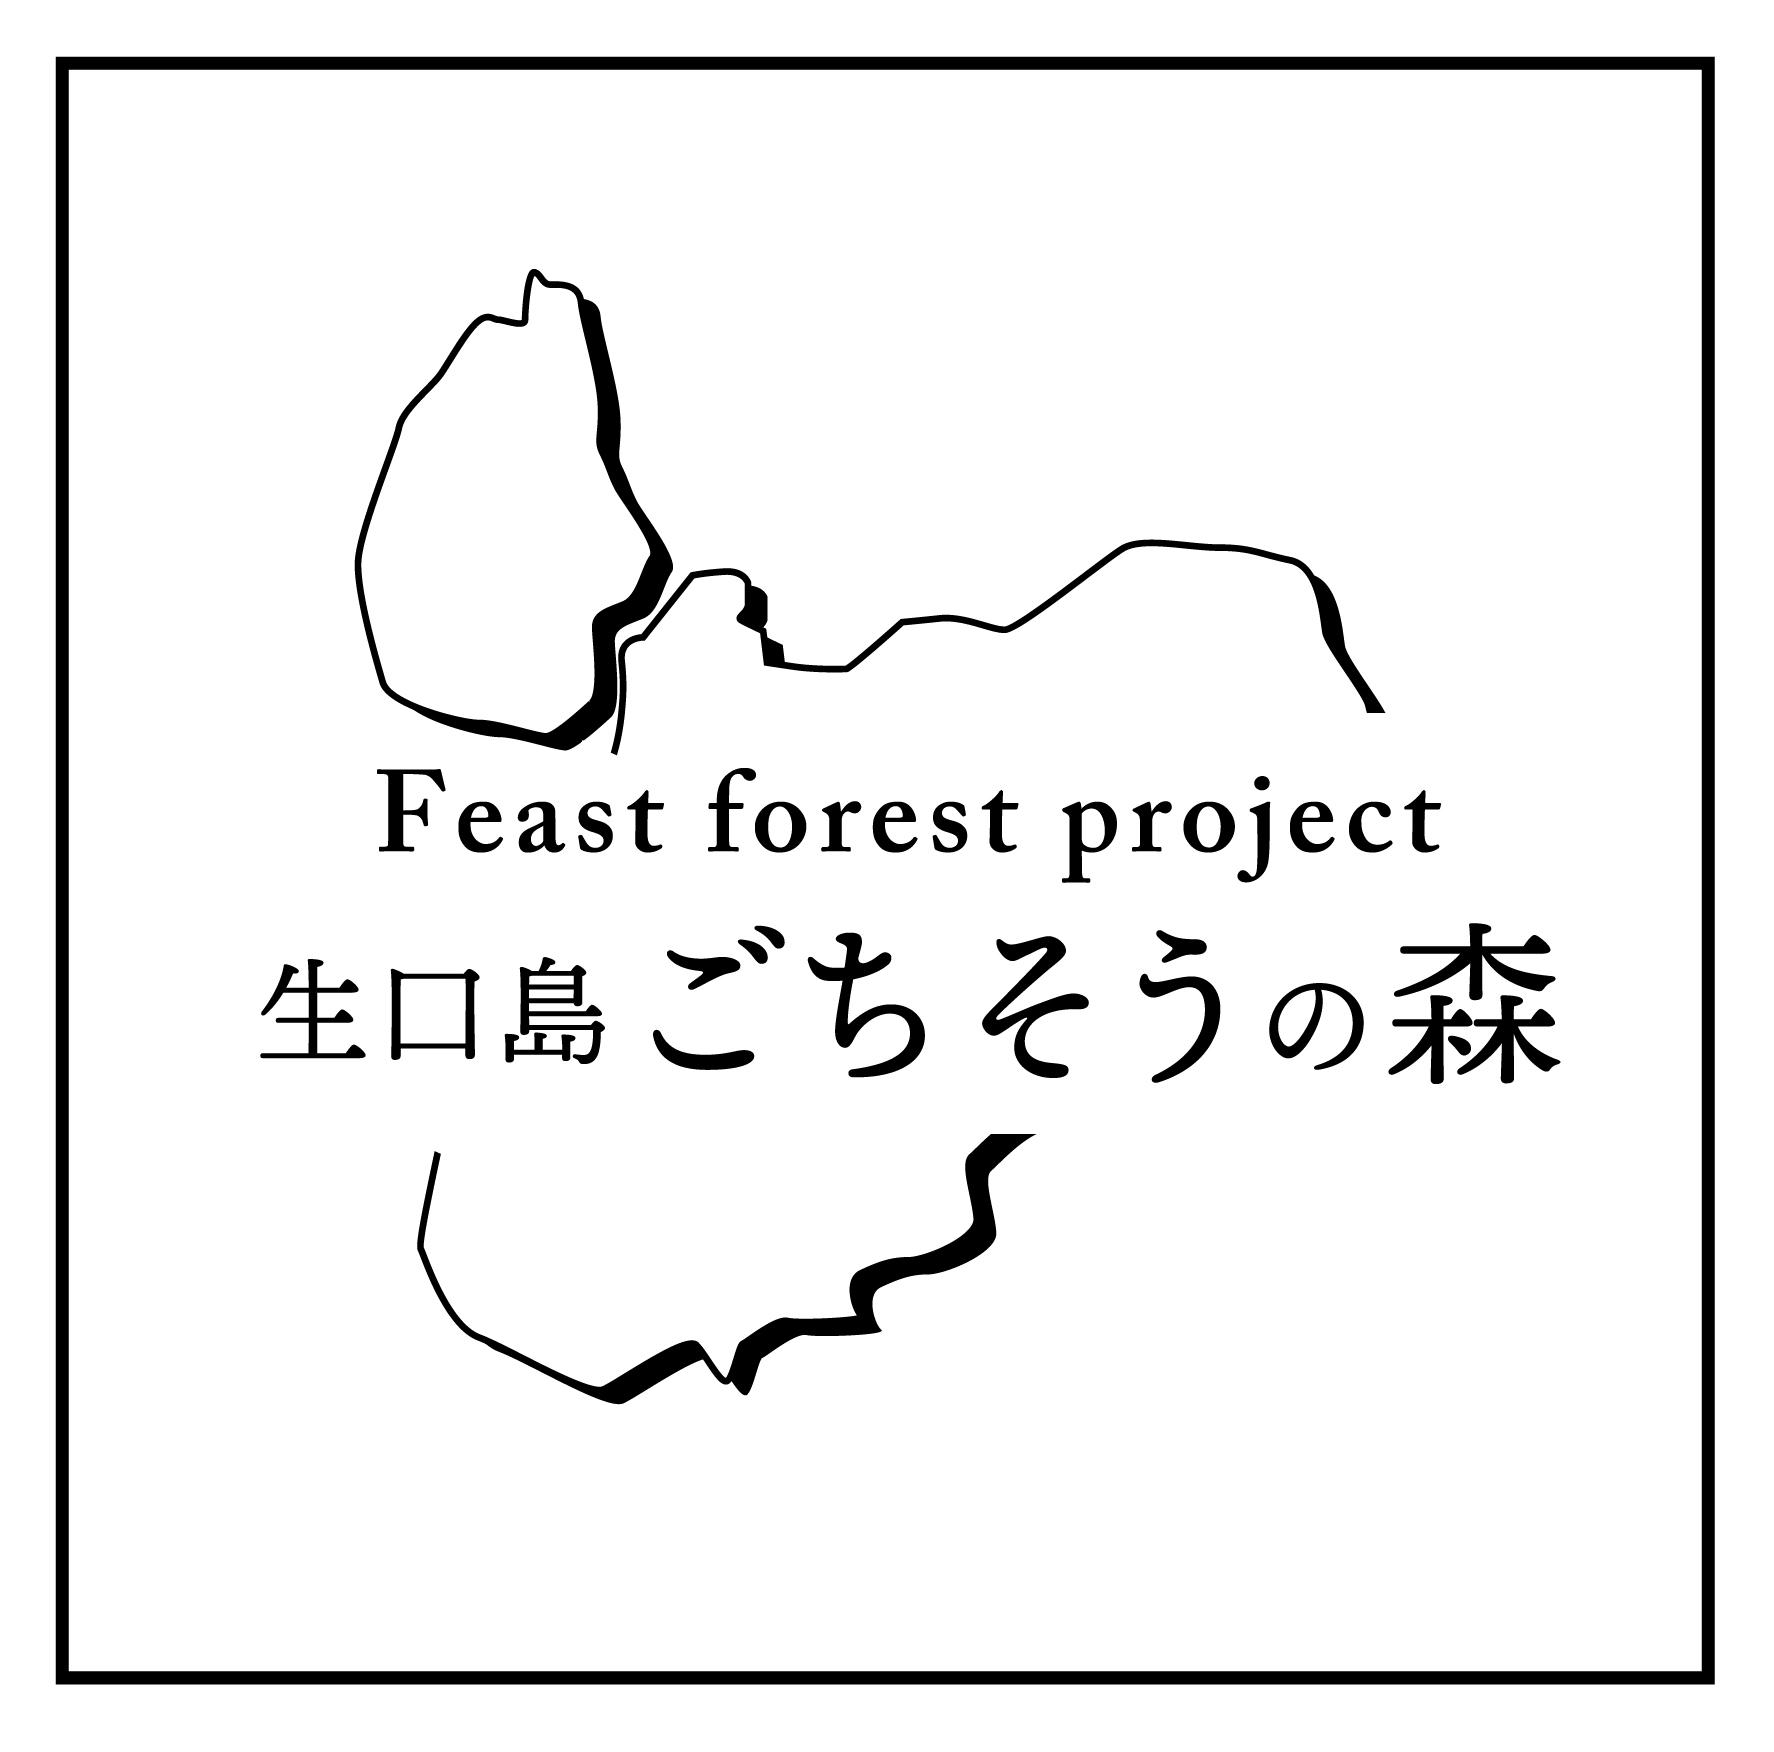 "【EVENT】日本一のレモン産地、広島尾道の離島""生口島ごちそうの森プロジェクト~Feast forest project~"" POP UP SHOPスタート!(Social entertainment circus Vol.19)"